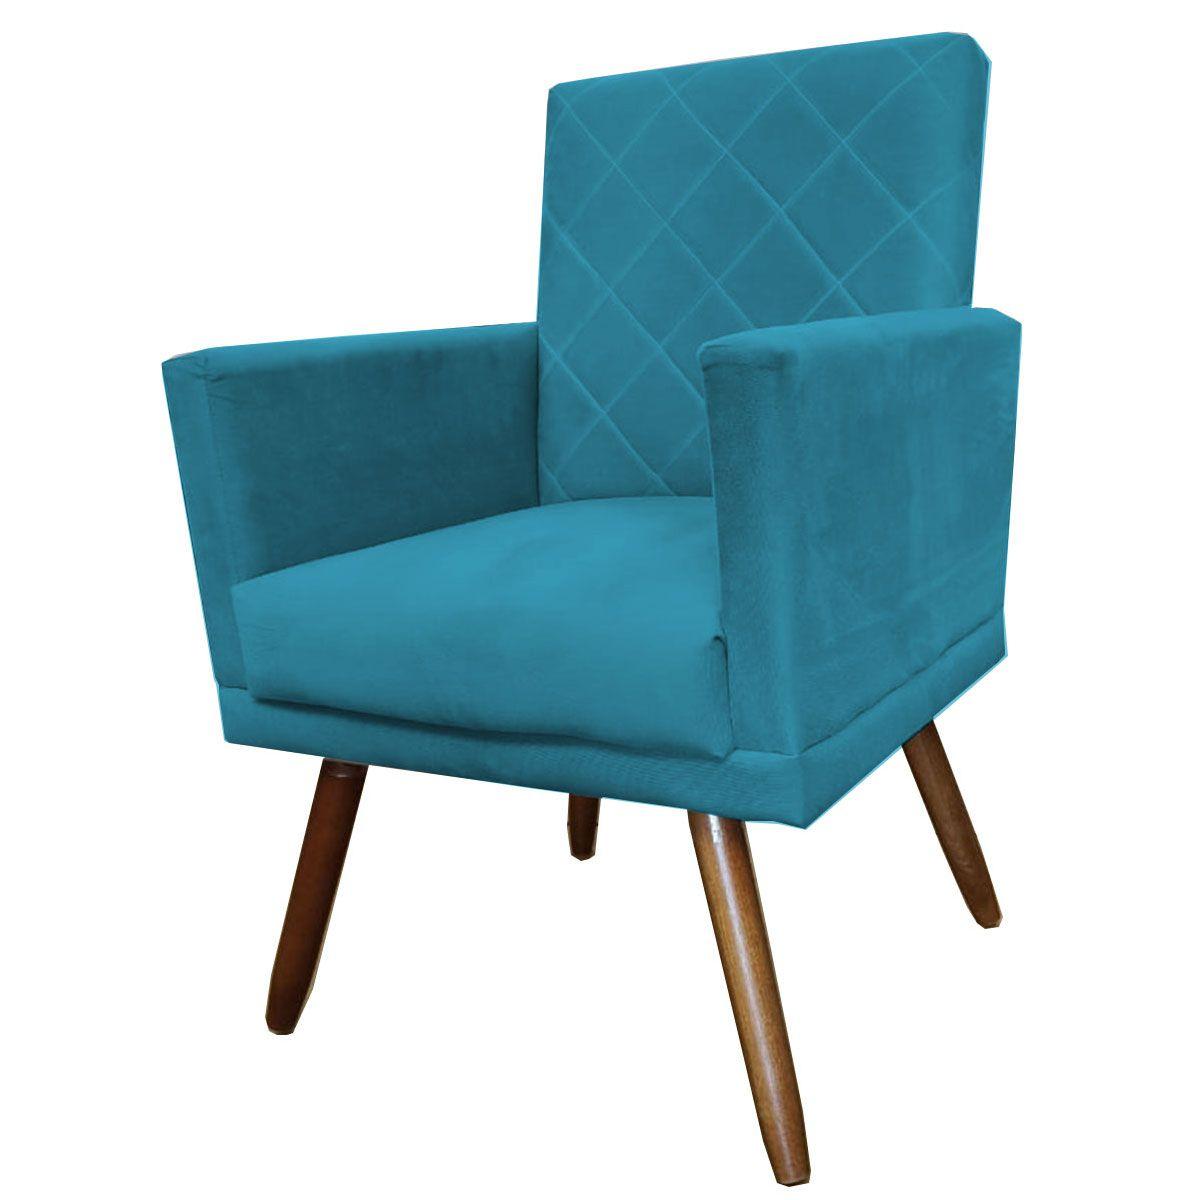 Kit 2 Poltronas Decorativas New Beatriz Pé Palito Azul